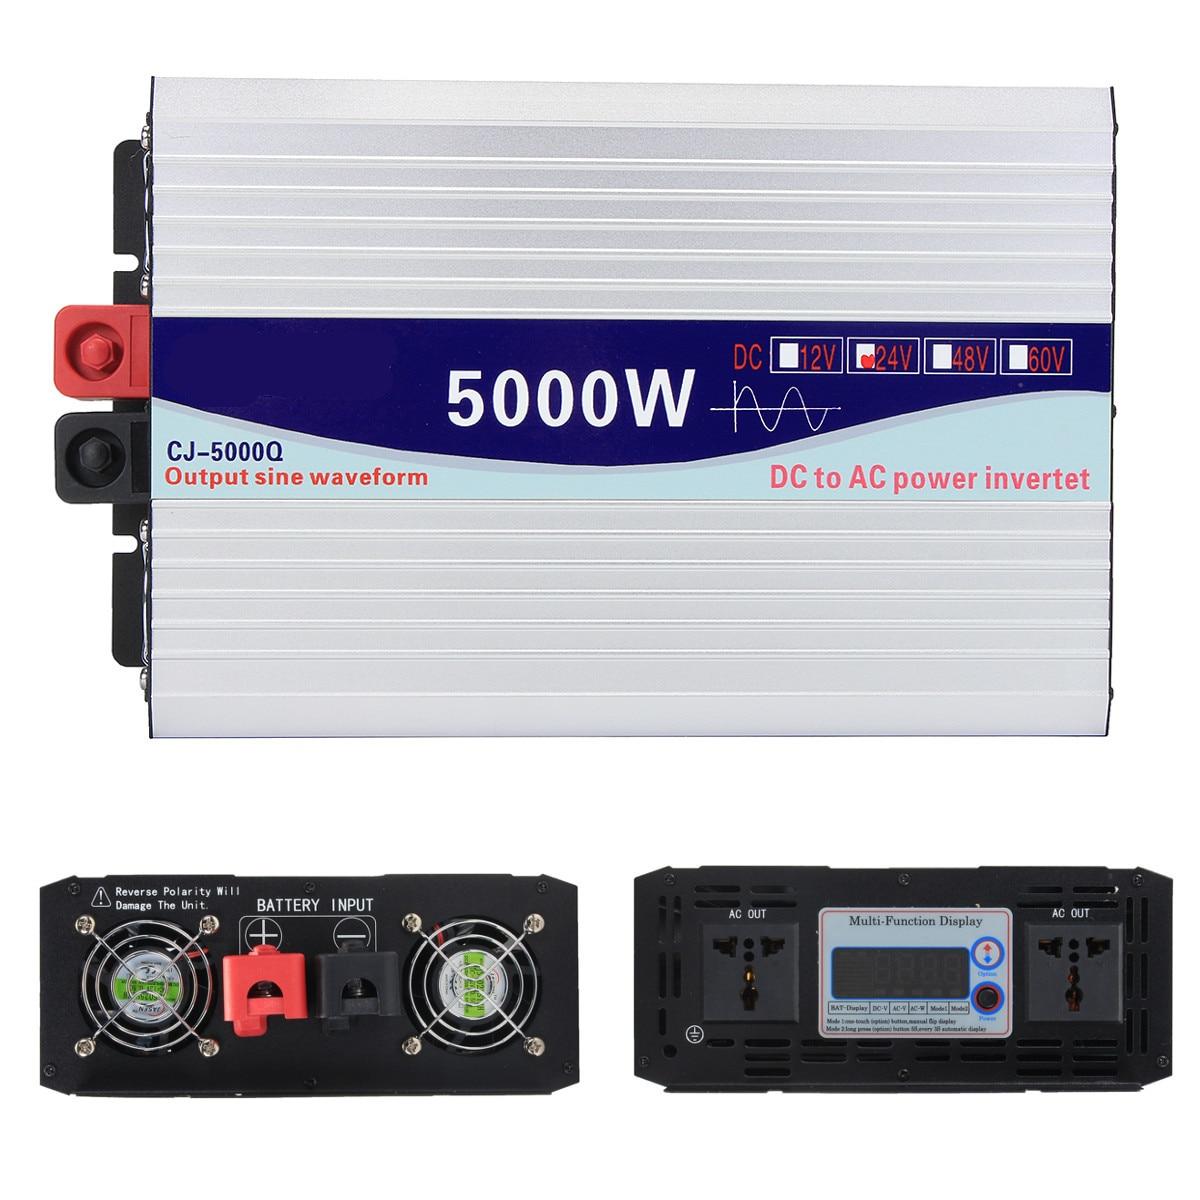 Écran Intelligent pur onduleur à onde sinusoïdale 12 V/24 V à 220 V 3000 W/4000 W/5000 W/6000 W convertisseur écran LCD - 4